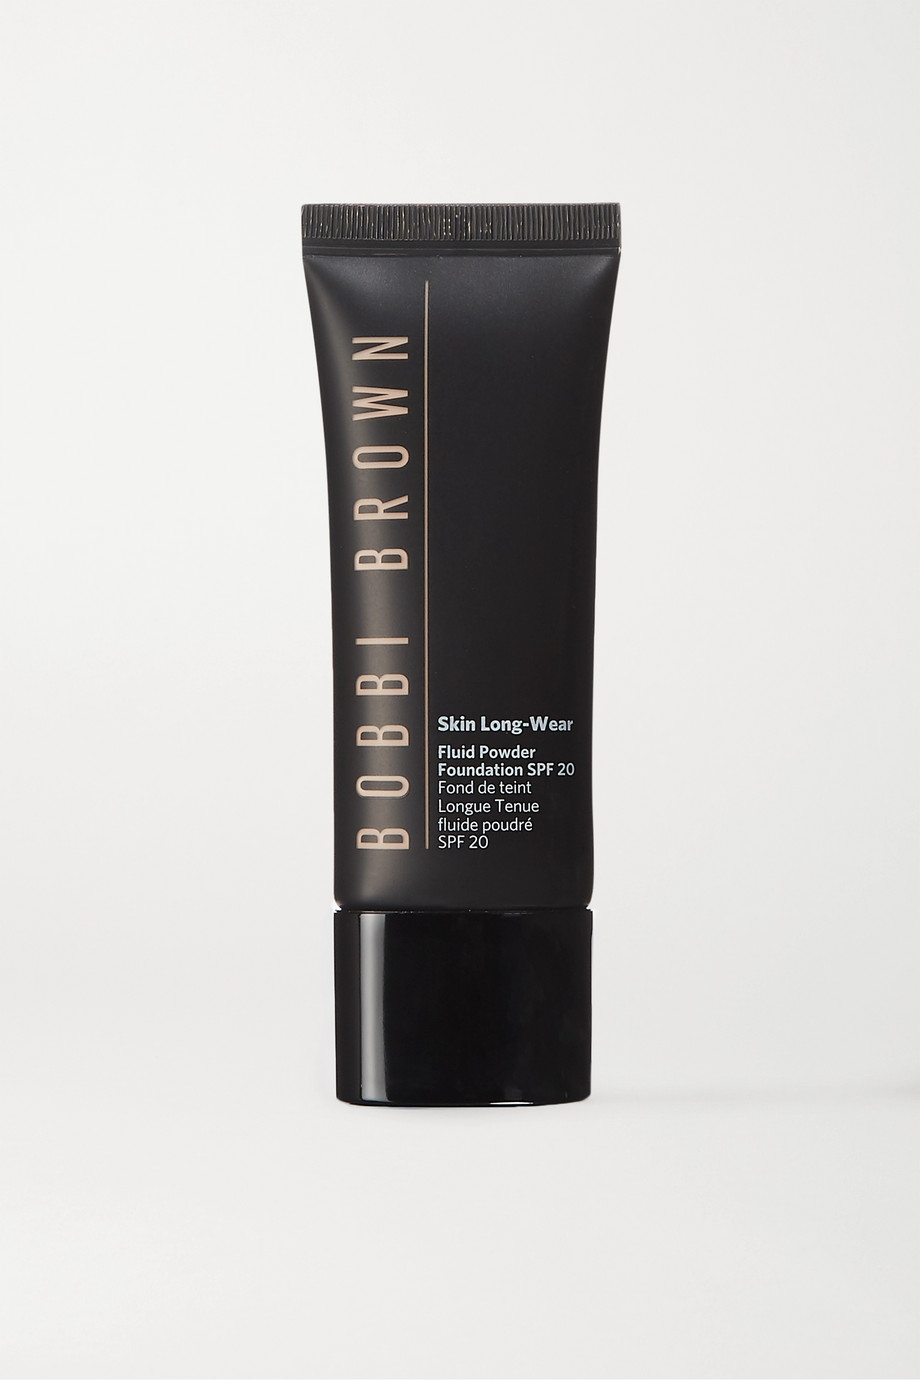 Bobbi Brown Skin Long-Wear Fluid Powder Foundation SPF20 - Cool Honey